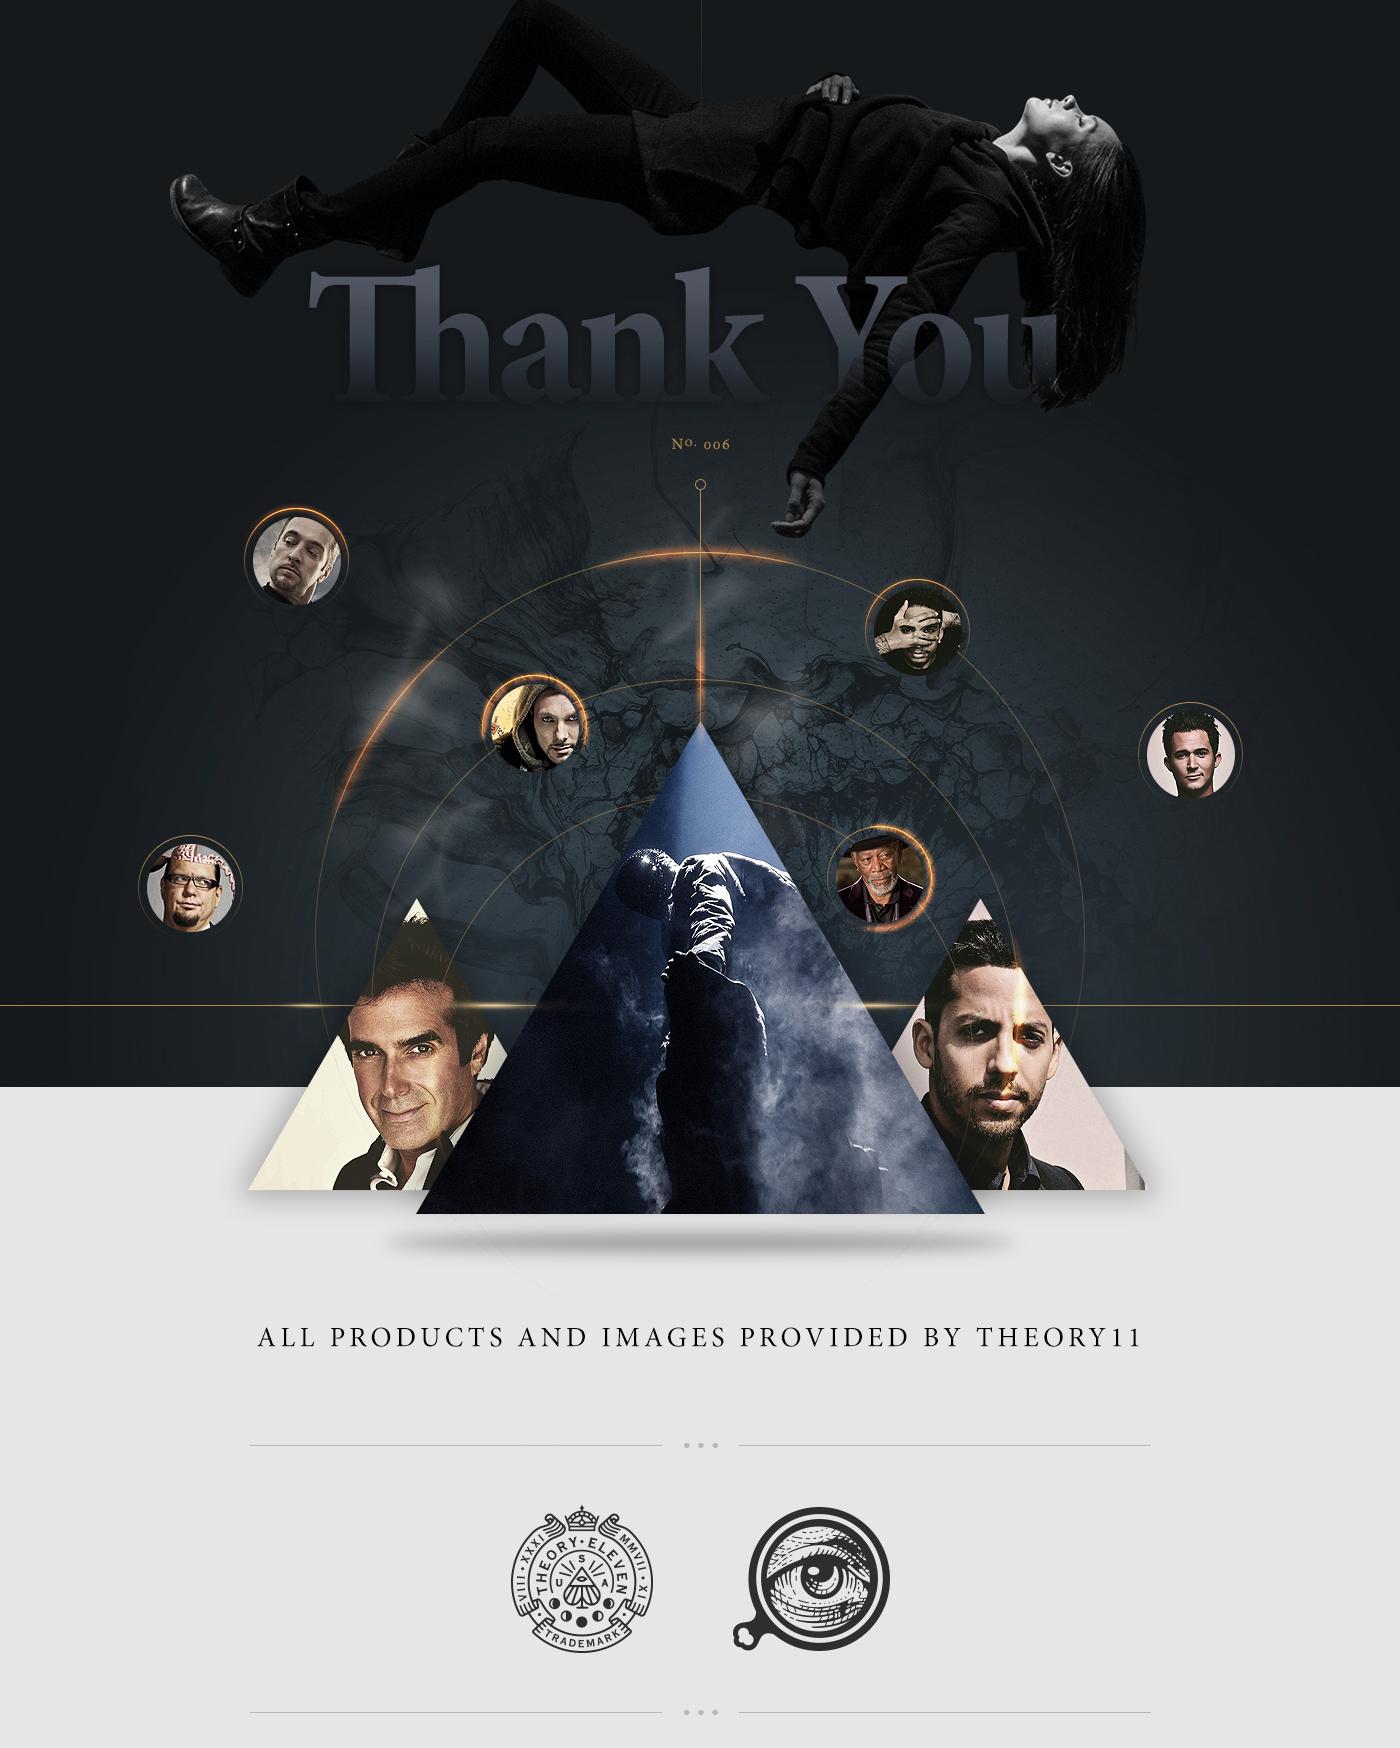 Web ux UI Website homepage Responsive design site Magic   dark texture black